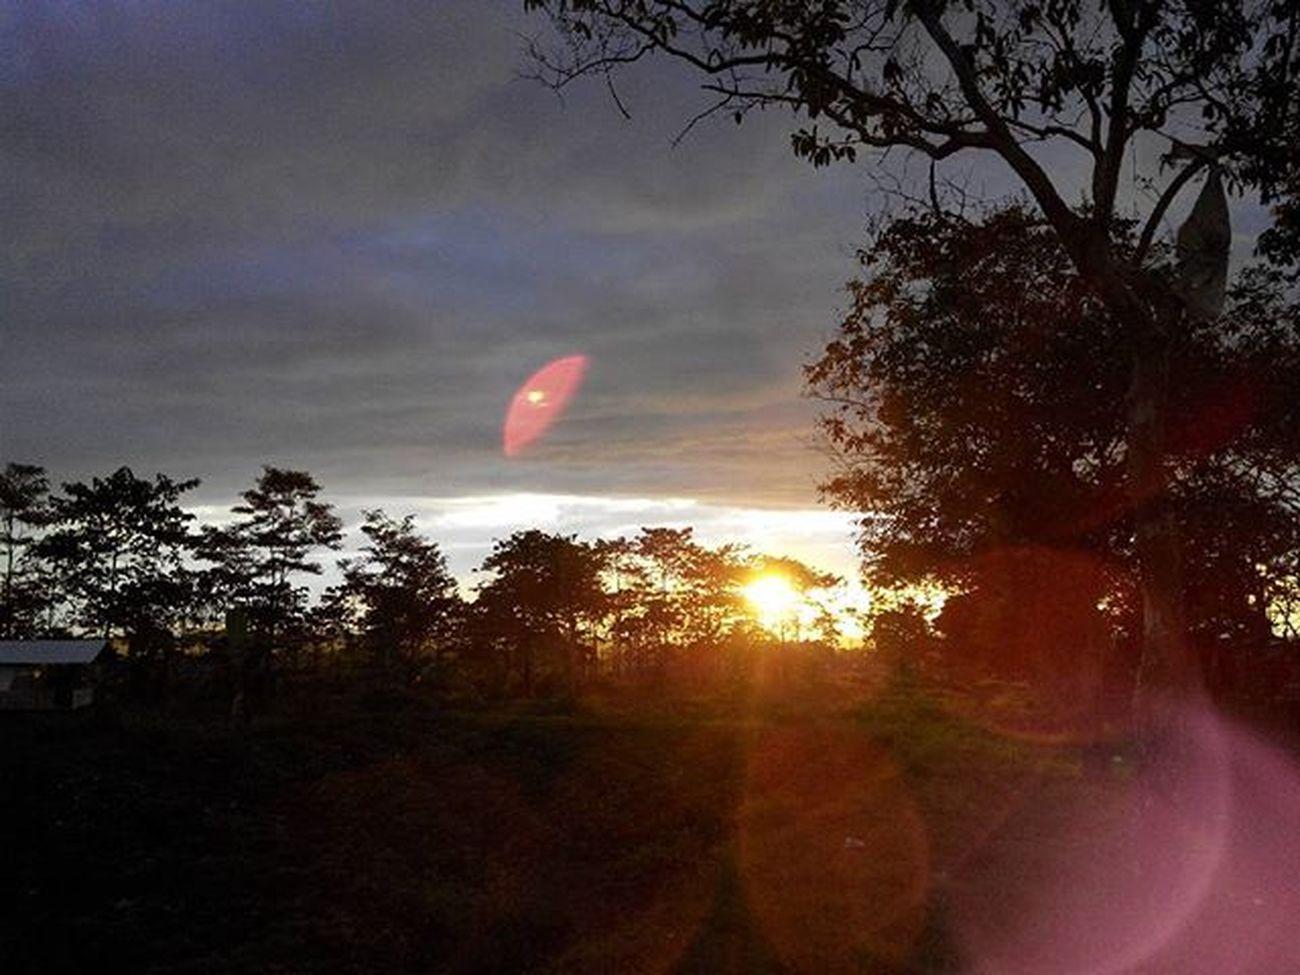 selamat Pagi dari Linggarjati Monumenpersaudaraan bersama Besitua CB100 Kuninganjabar Cirebon  Lenovotography Pocketphotography Photooftheday Nature Sunrise Lzybstrd Photostory Classicbike Onroad